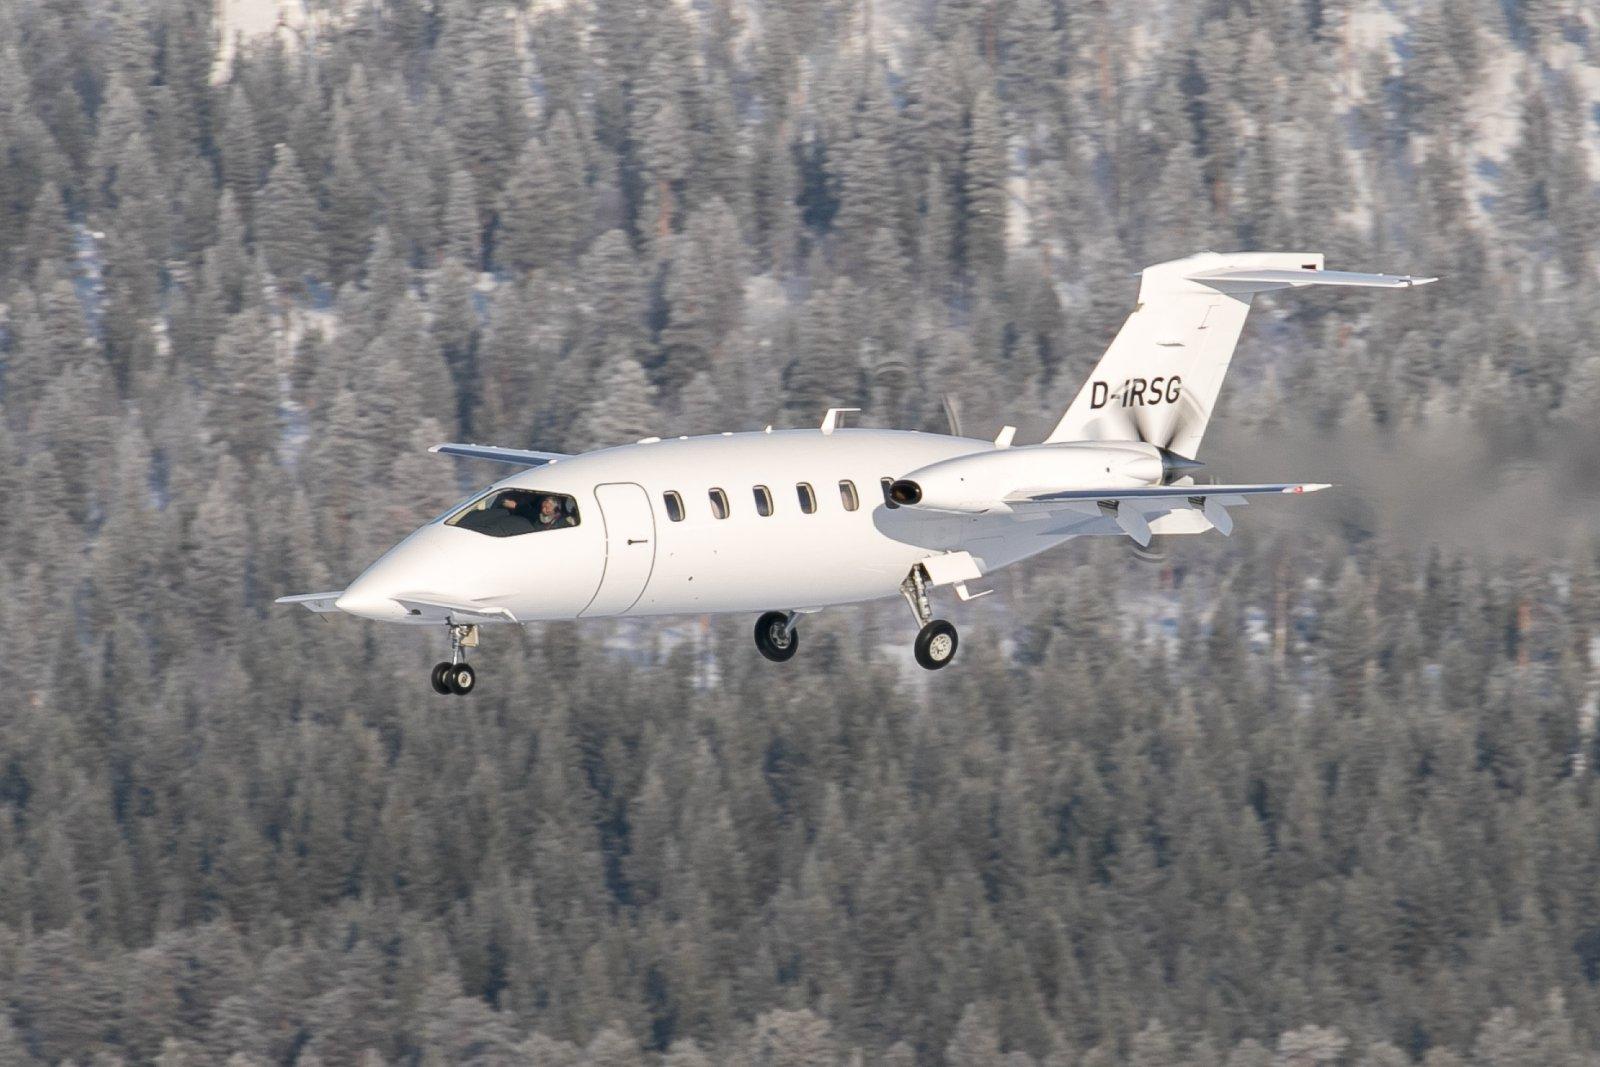 D-IRSG. 1.3.2020. Piaggio P-180 Avanti II